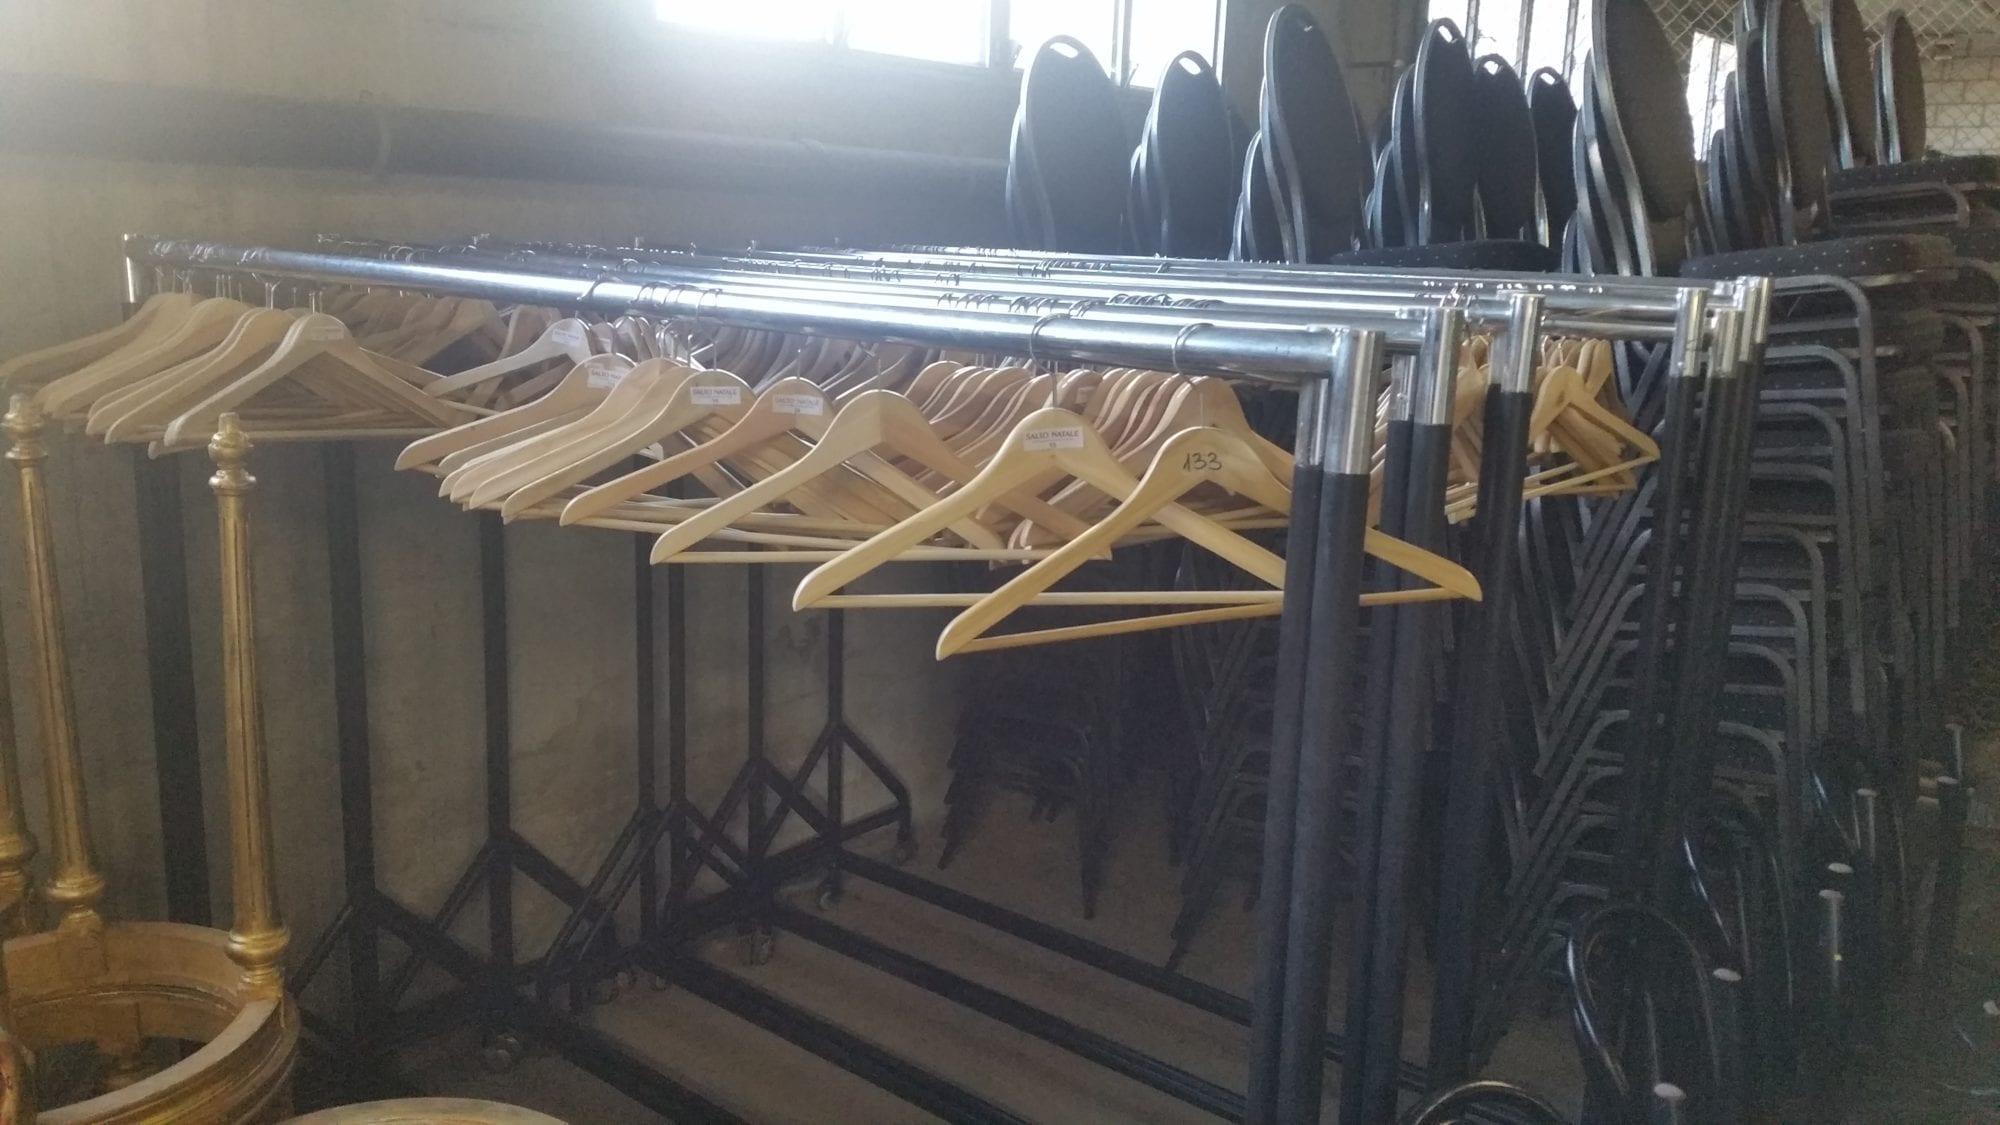 kleiderbügelbox mieten rent-a-lounge 1